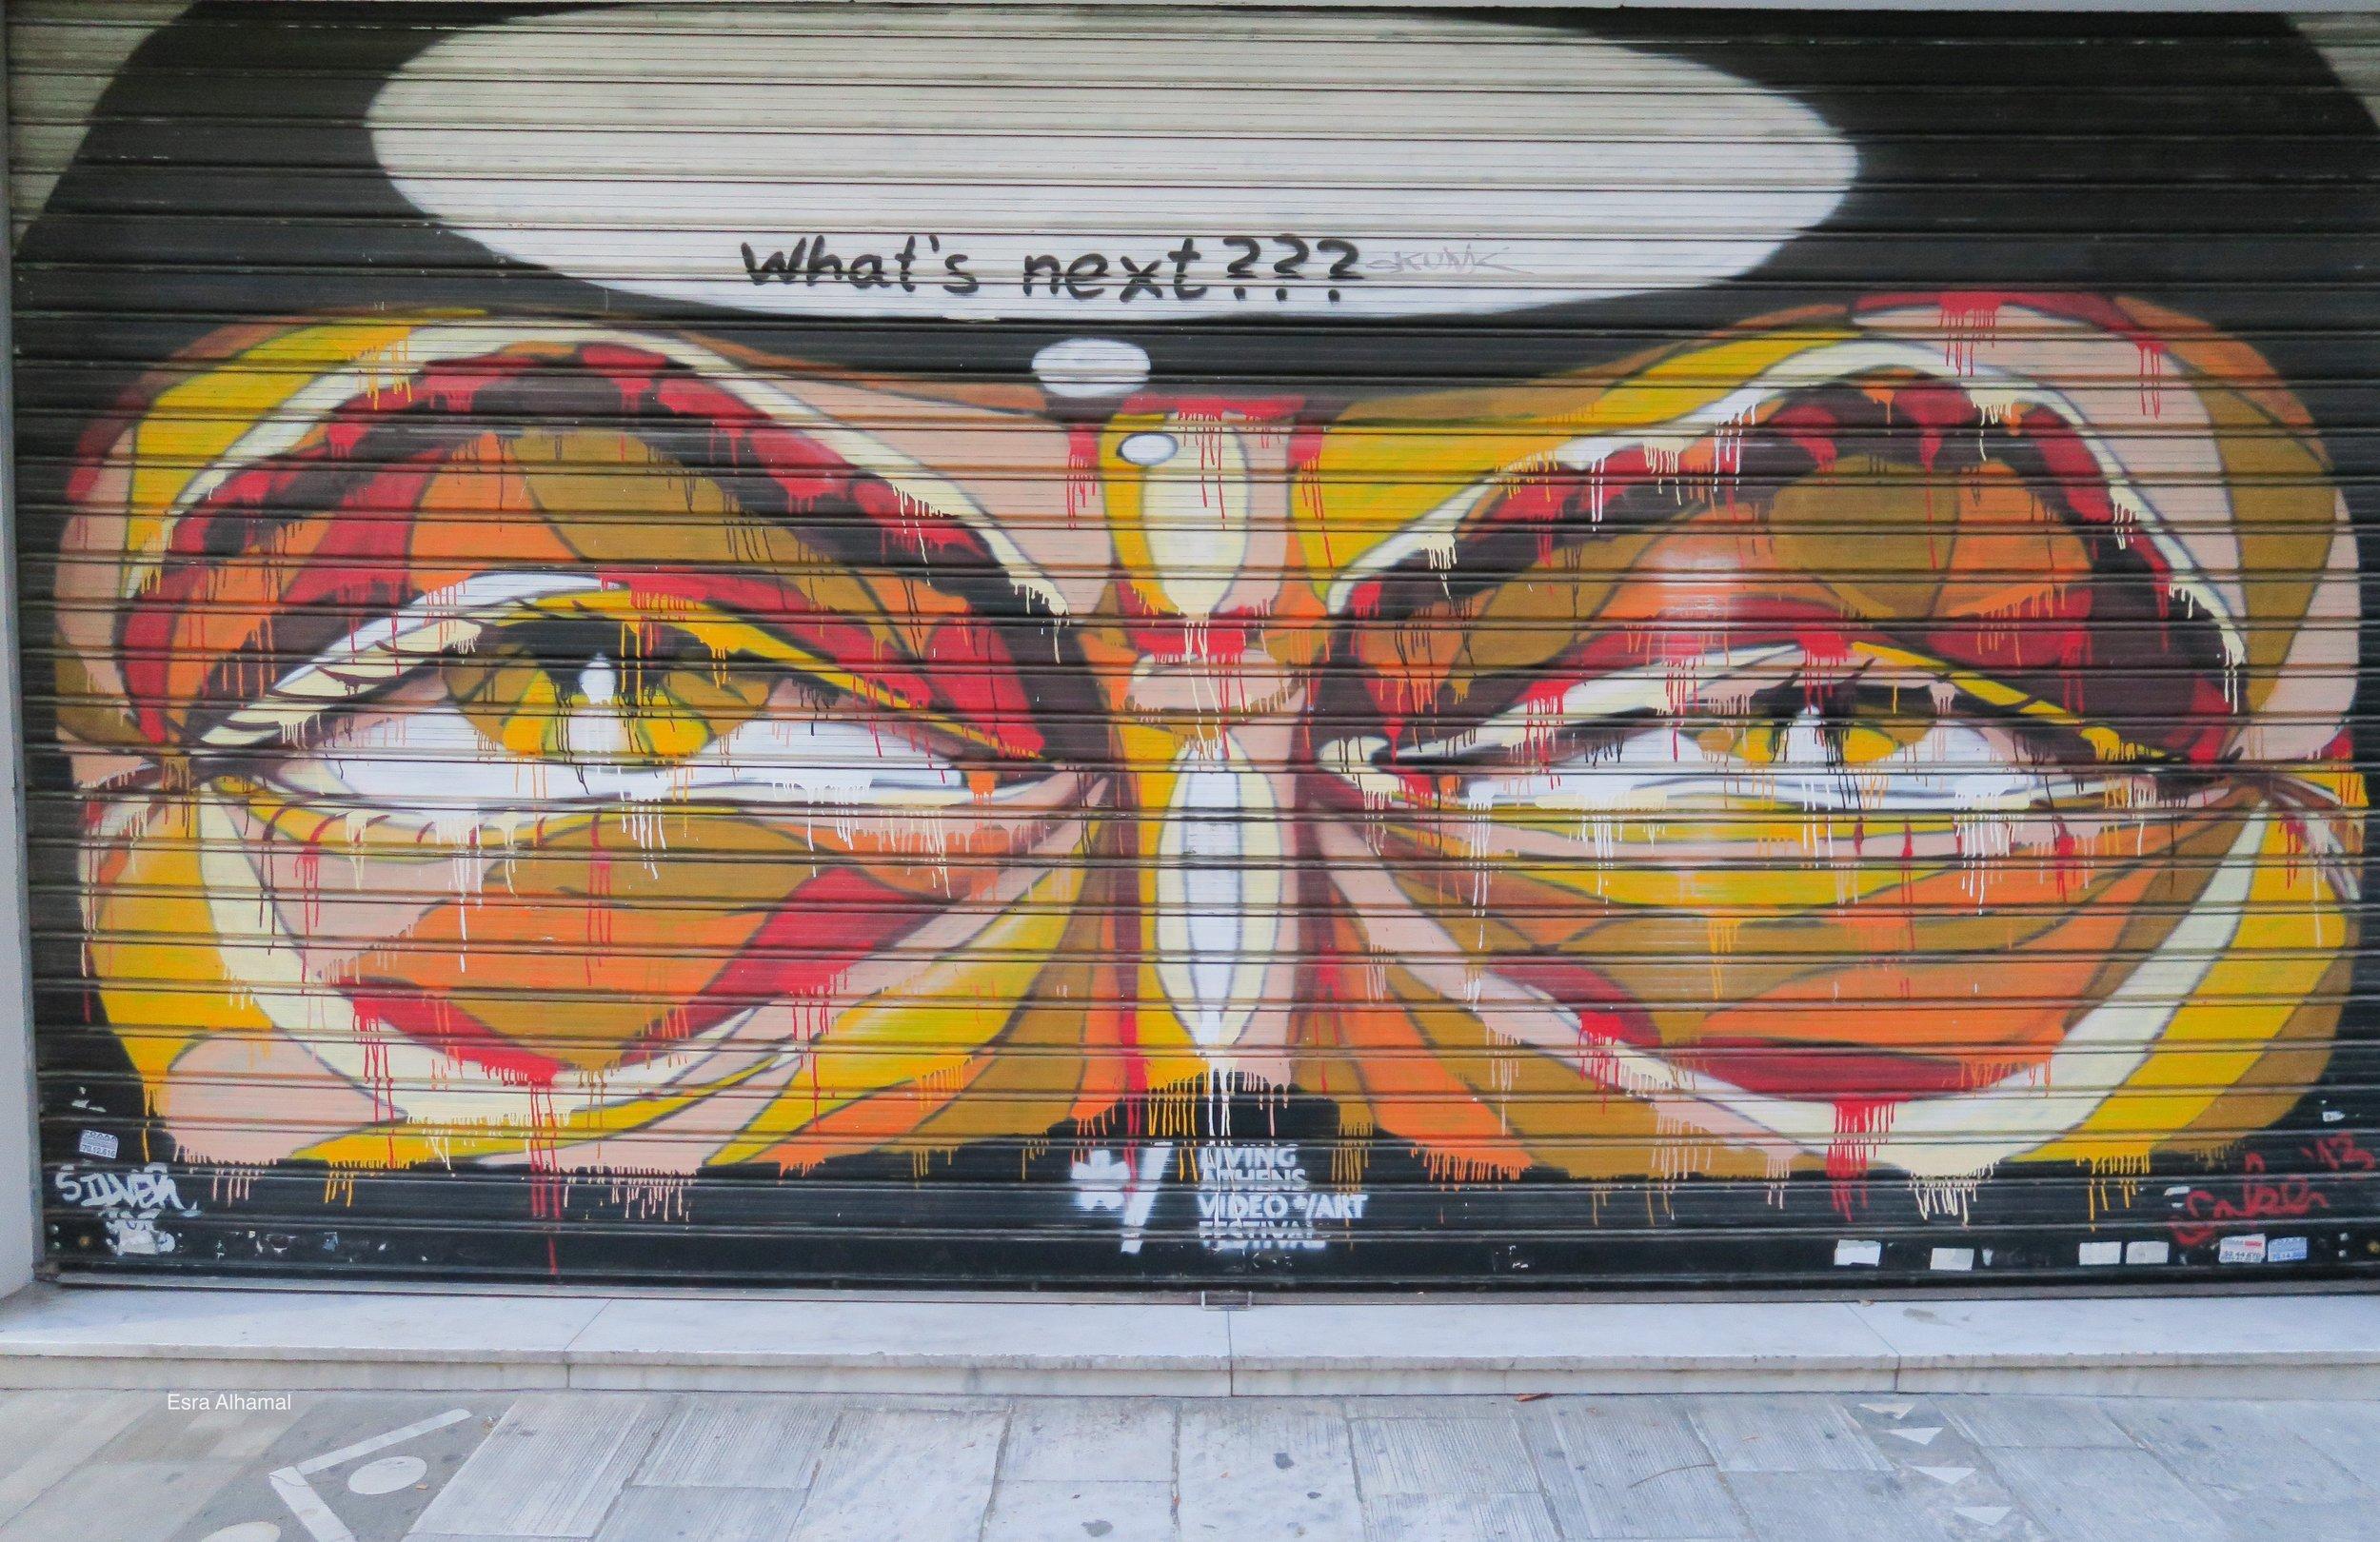 What's next? Graffiti